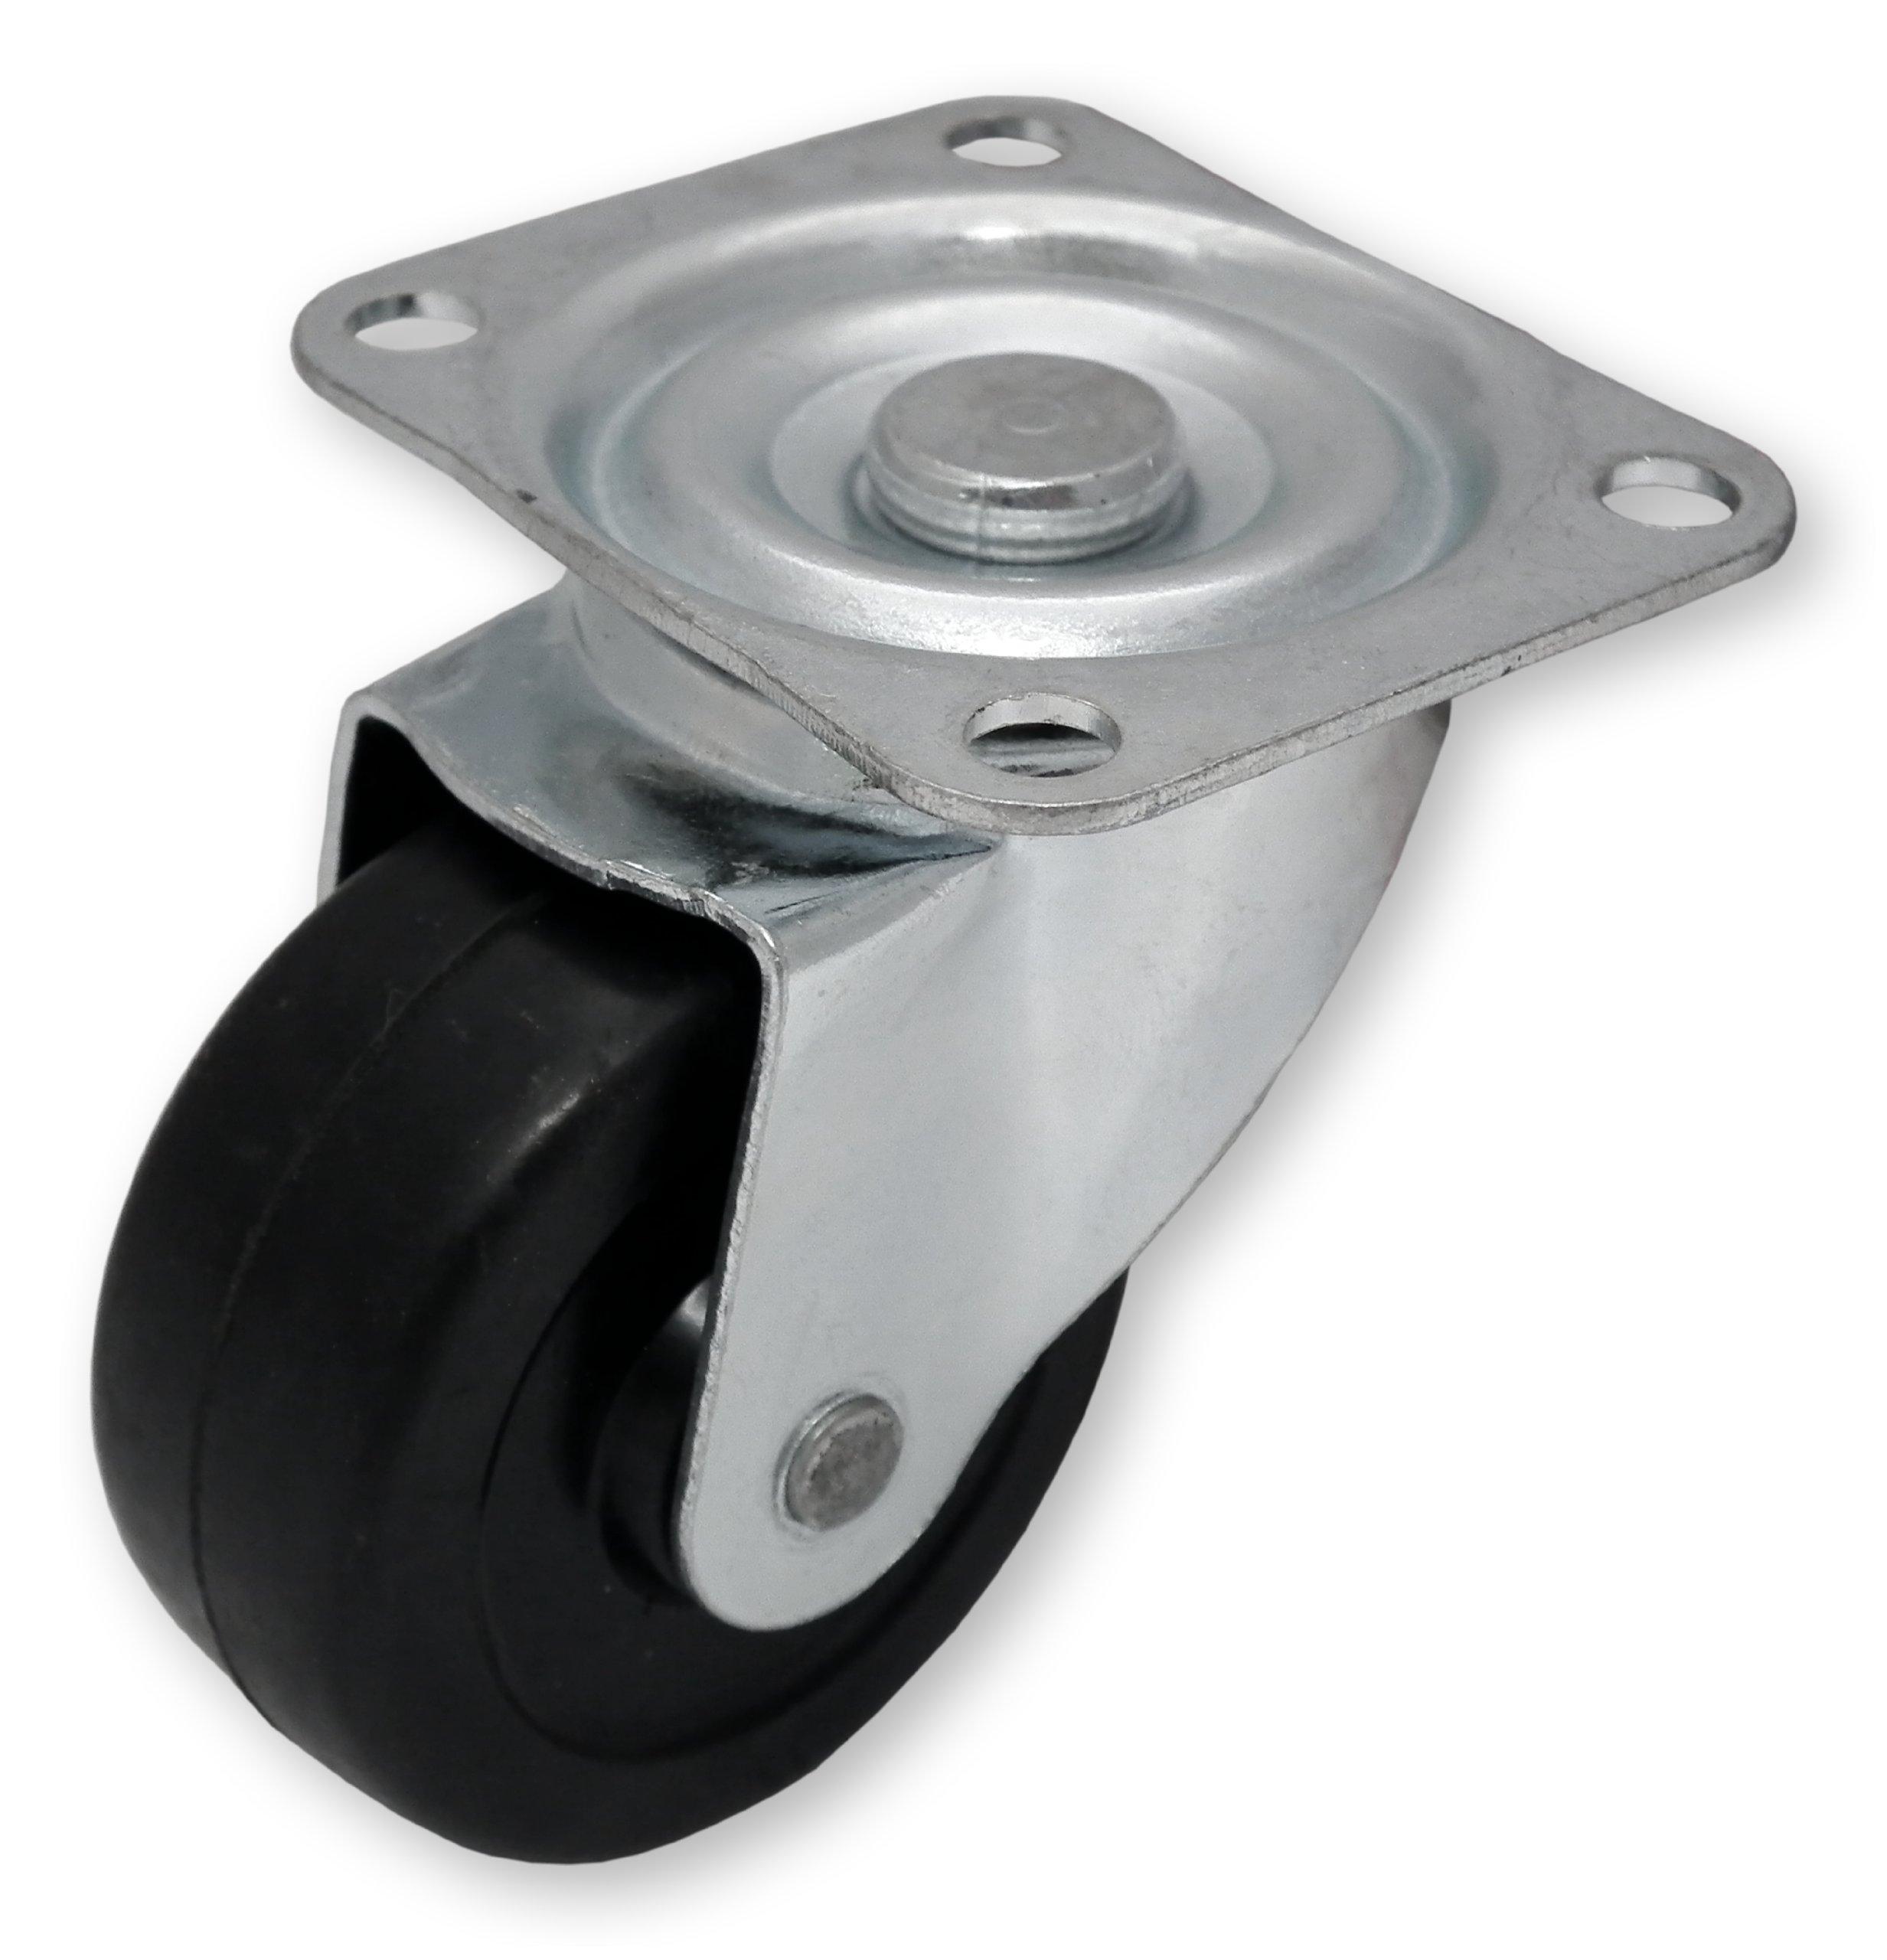 Castor Wheel Unbraked 40mm 38mm Stem Pin Fitting Black Push Fit Swivel Office Chair X10